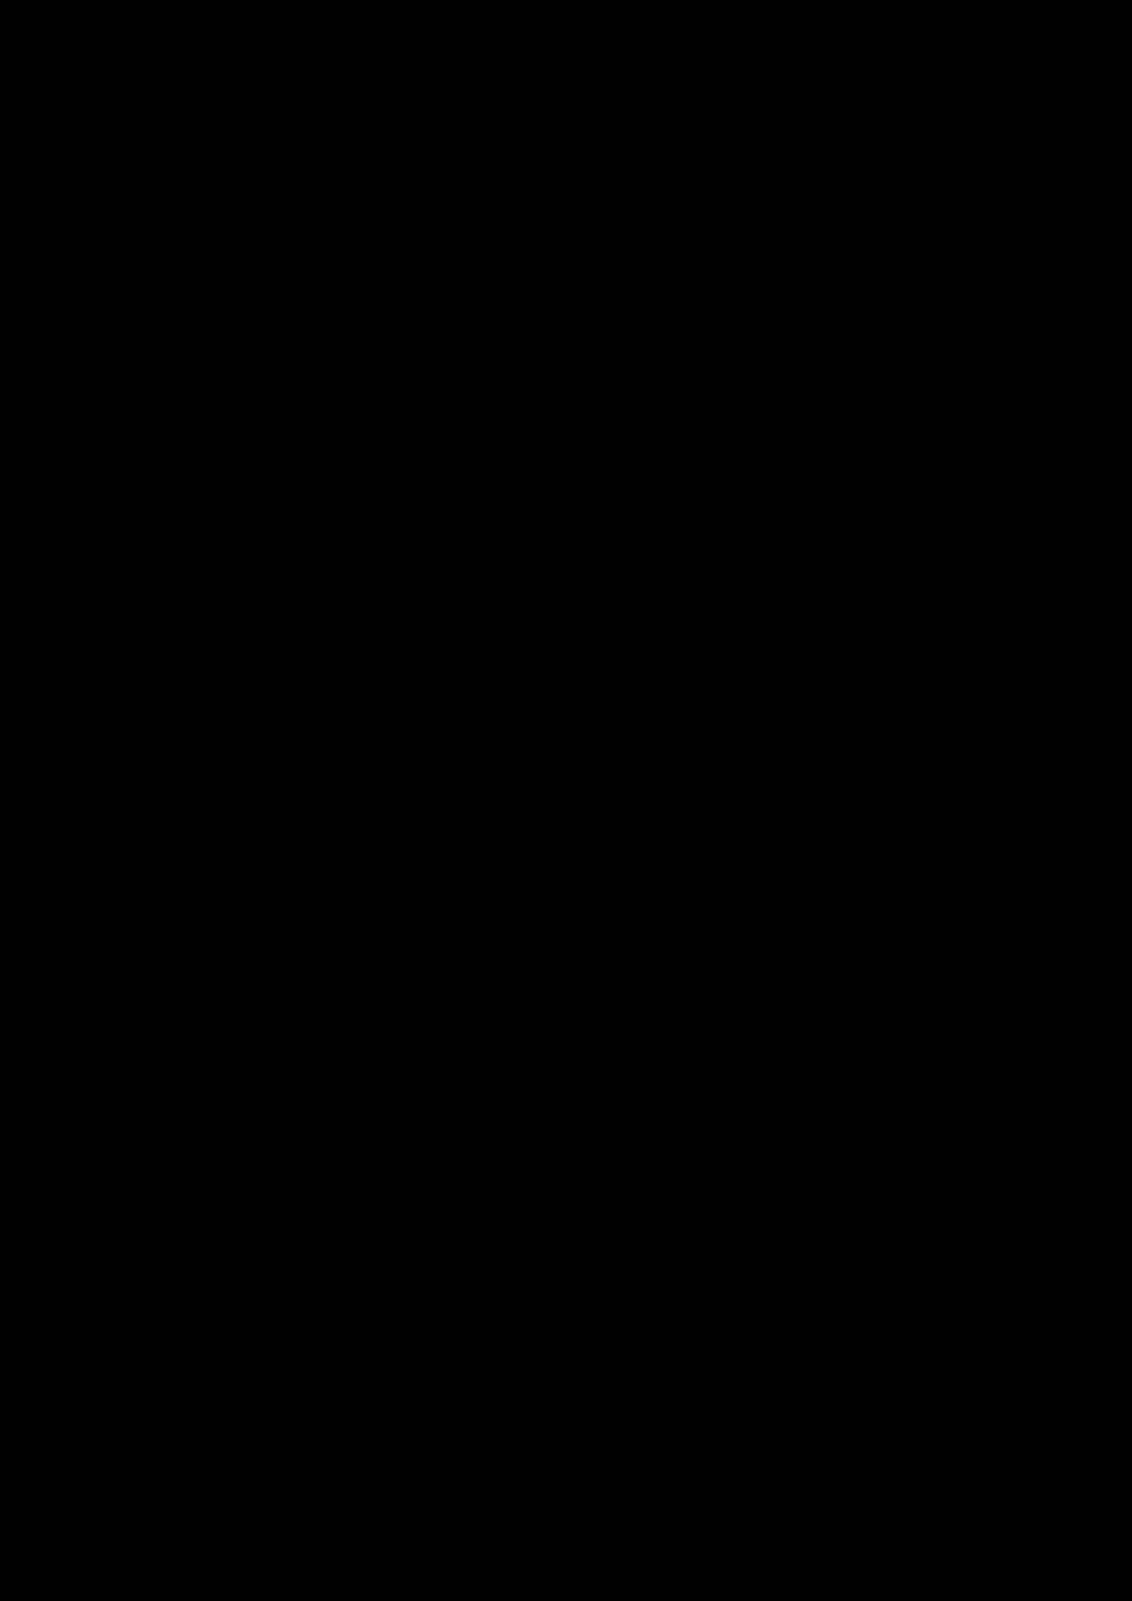 Korolevstvo slez slide, Image 16